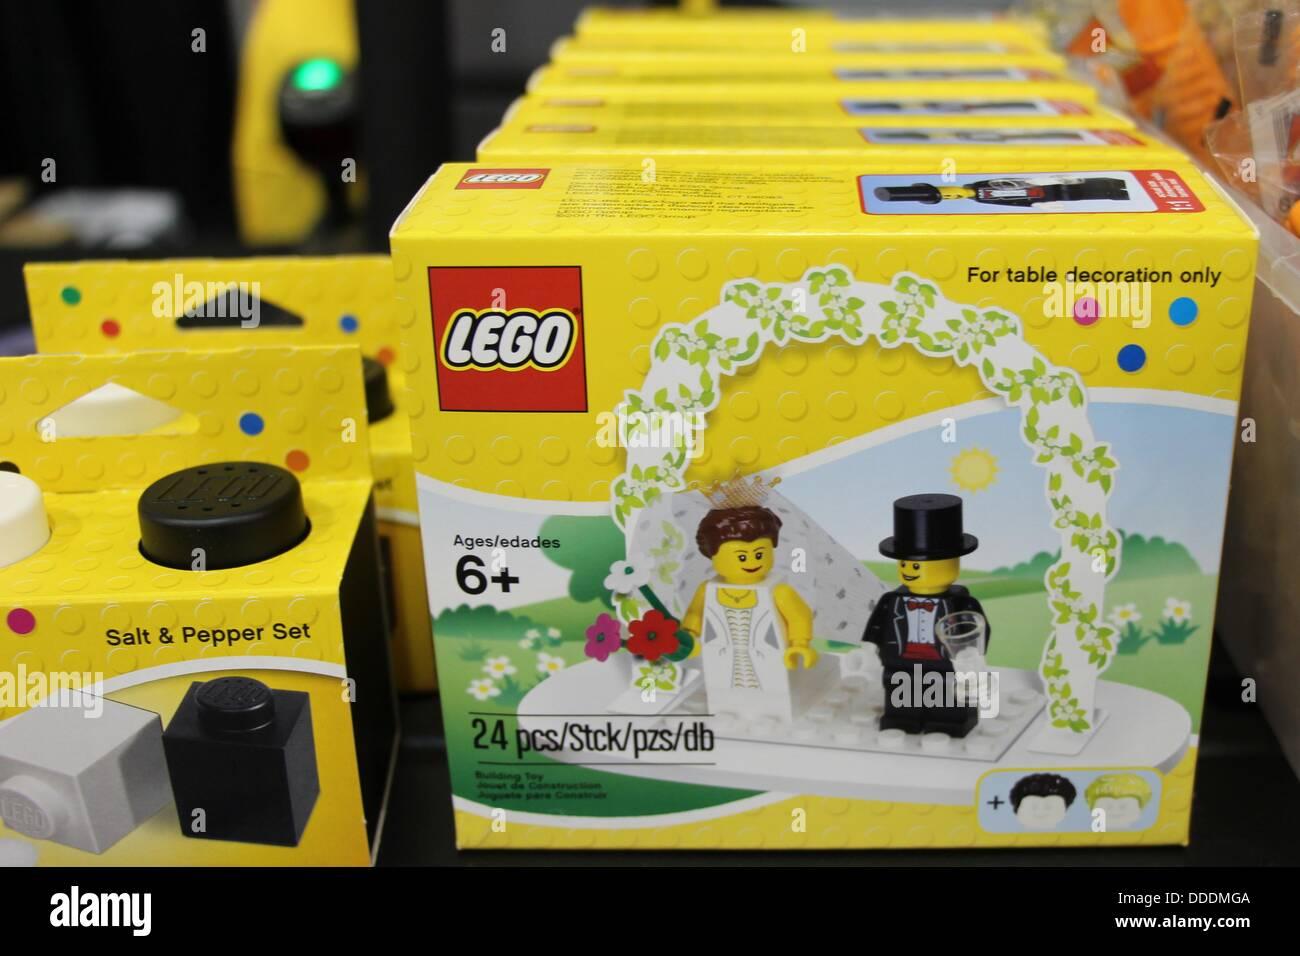 LEGO Wedding Cake Topper And Salt Pepper Set